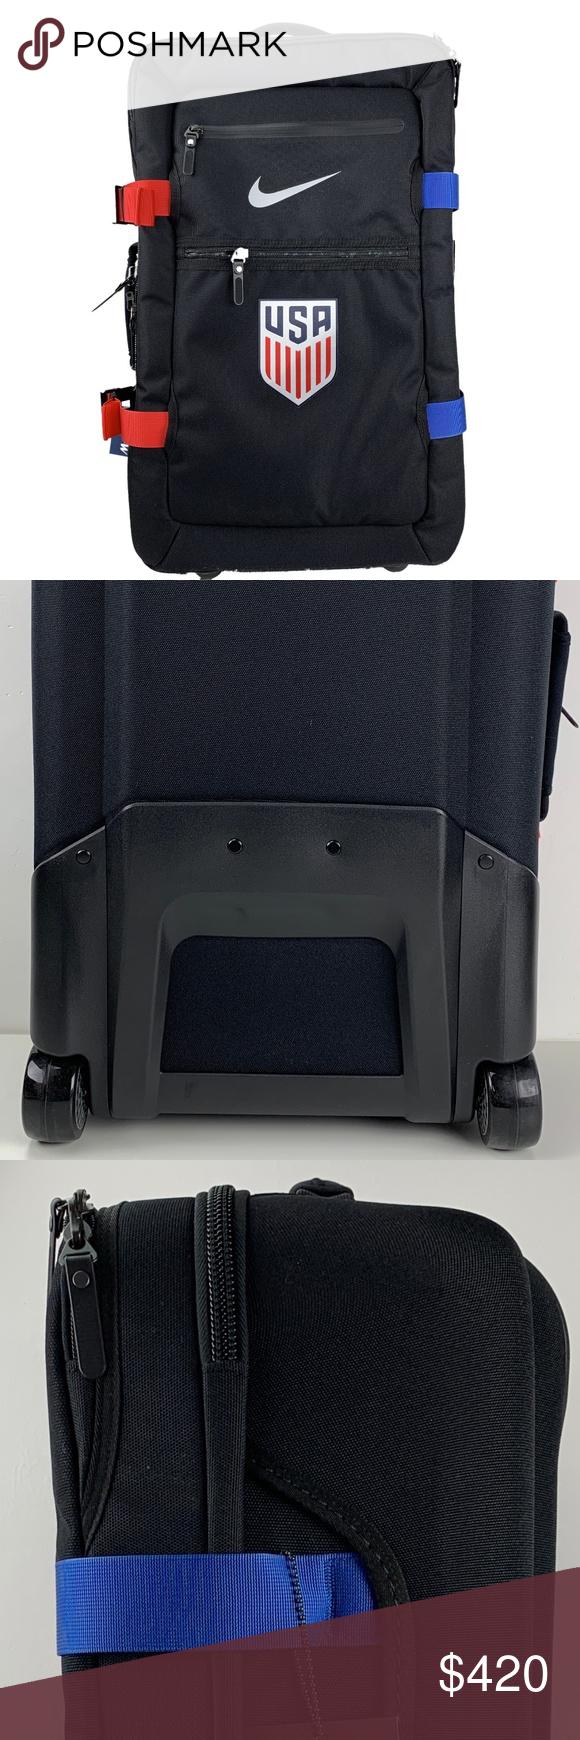 venta de tienda outlet llegando comprar real Nike USA FiftyOne49 Carry-on Luggage Bag Nike USA USMNT Player ...